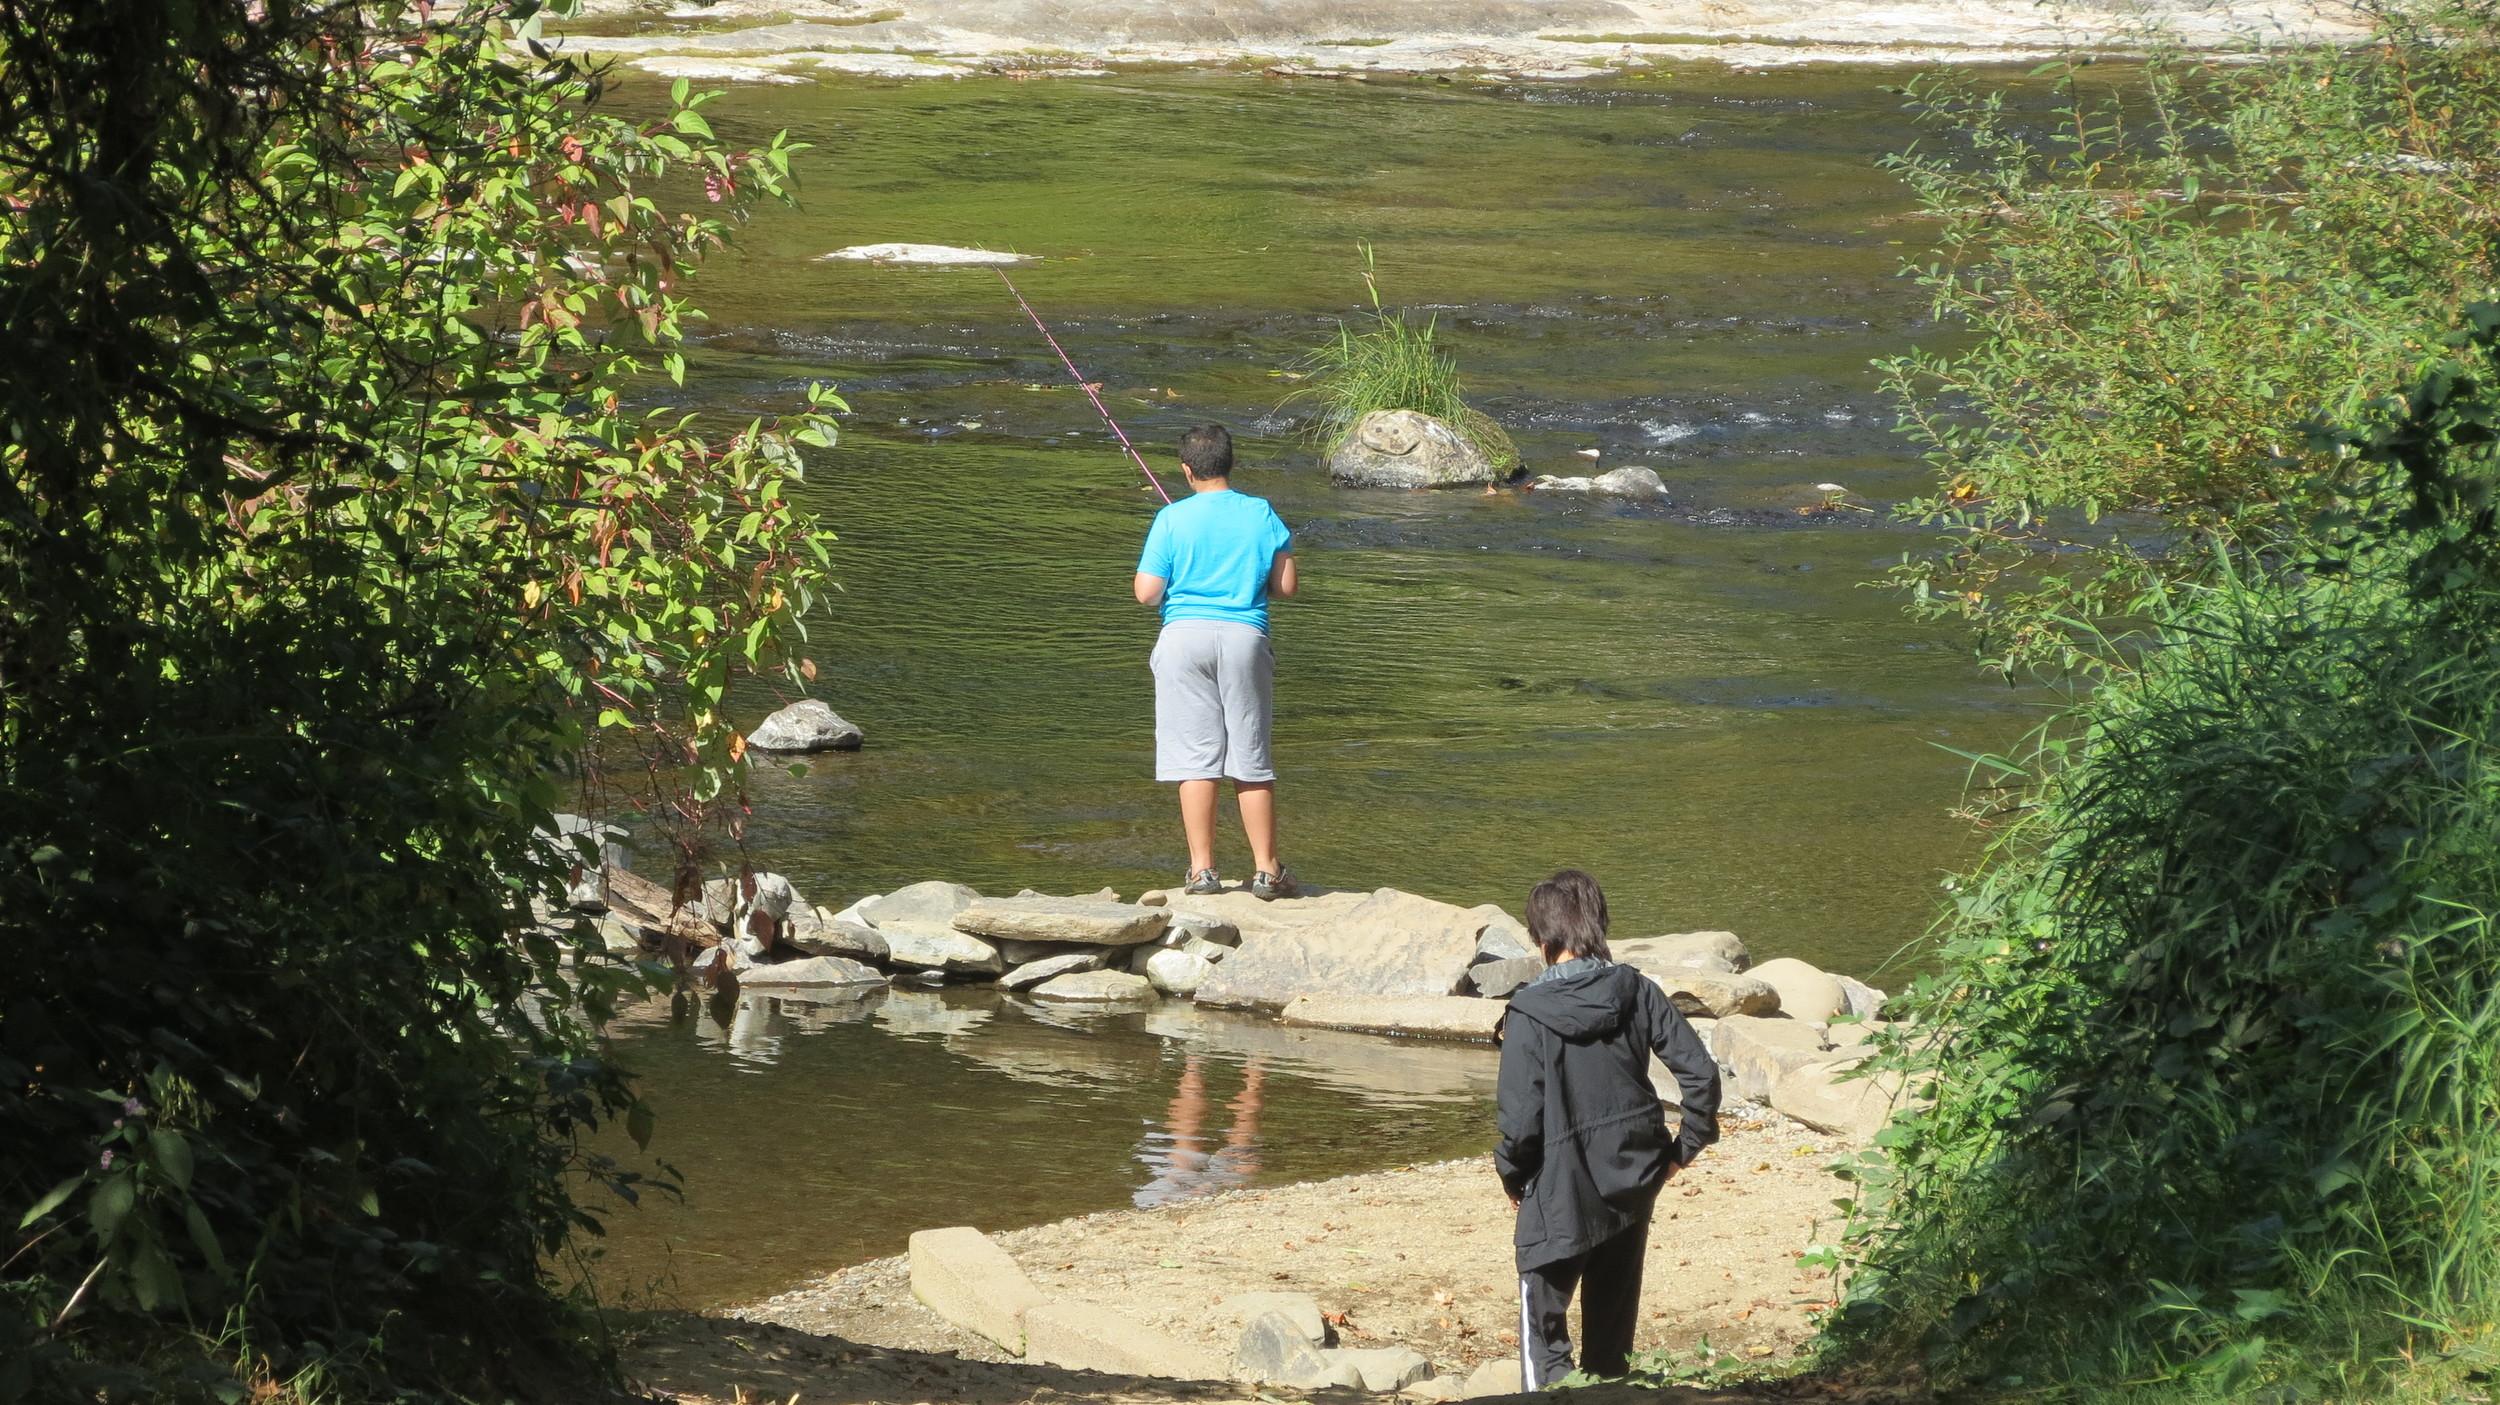 Alsea River, Blackberry Campground, Central Oregon Coast